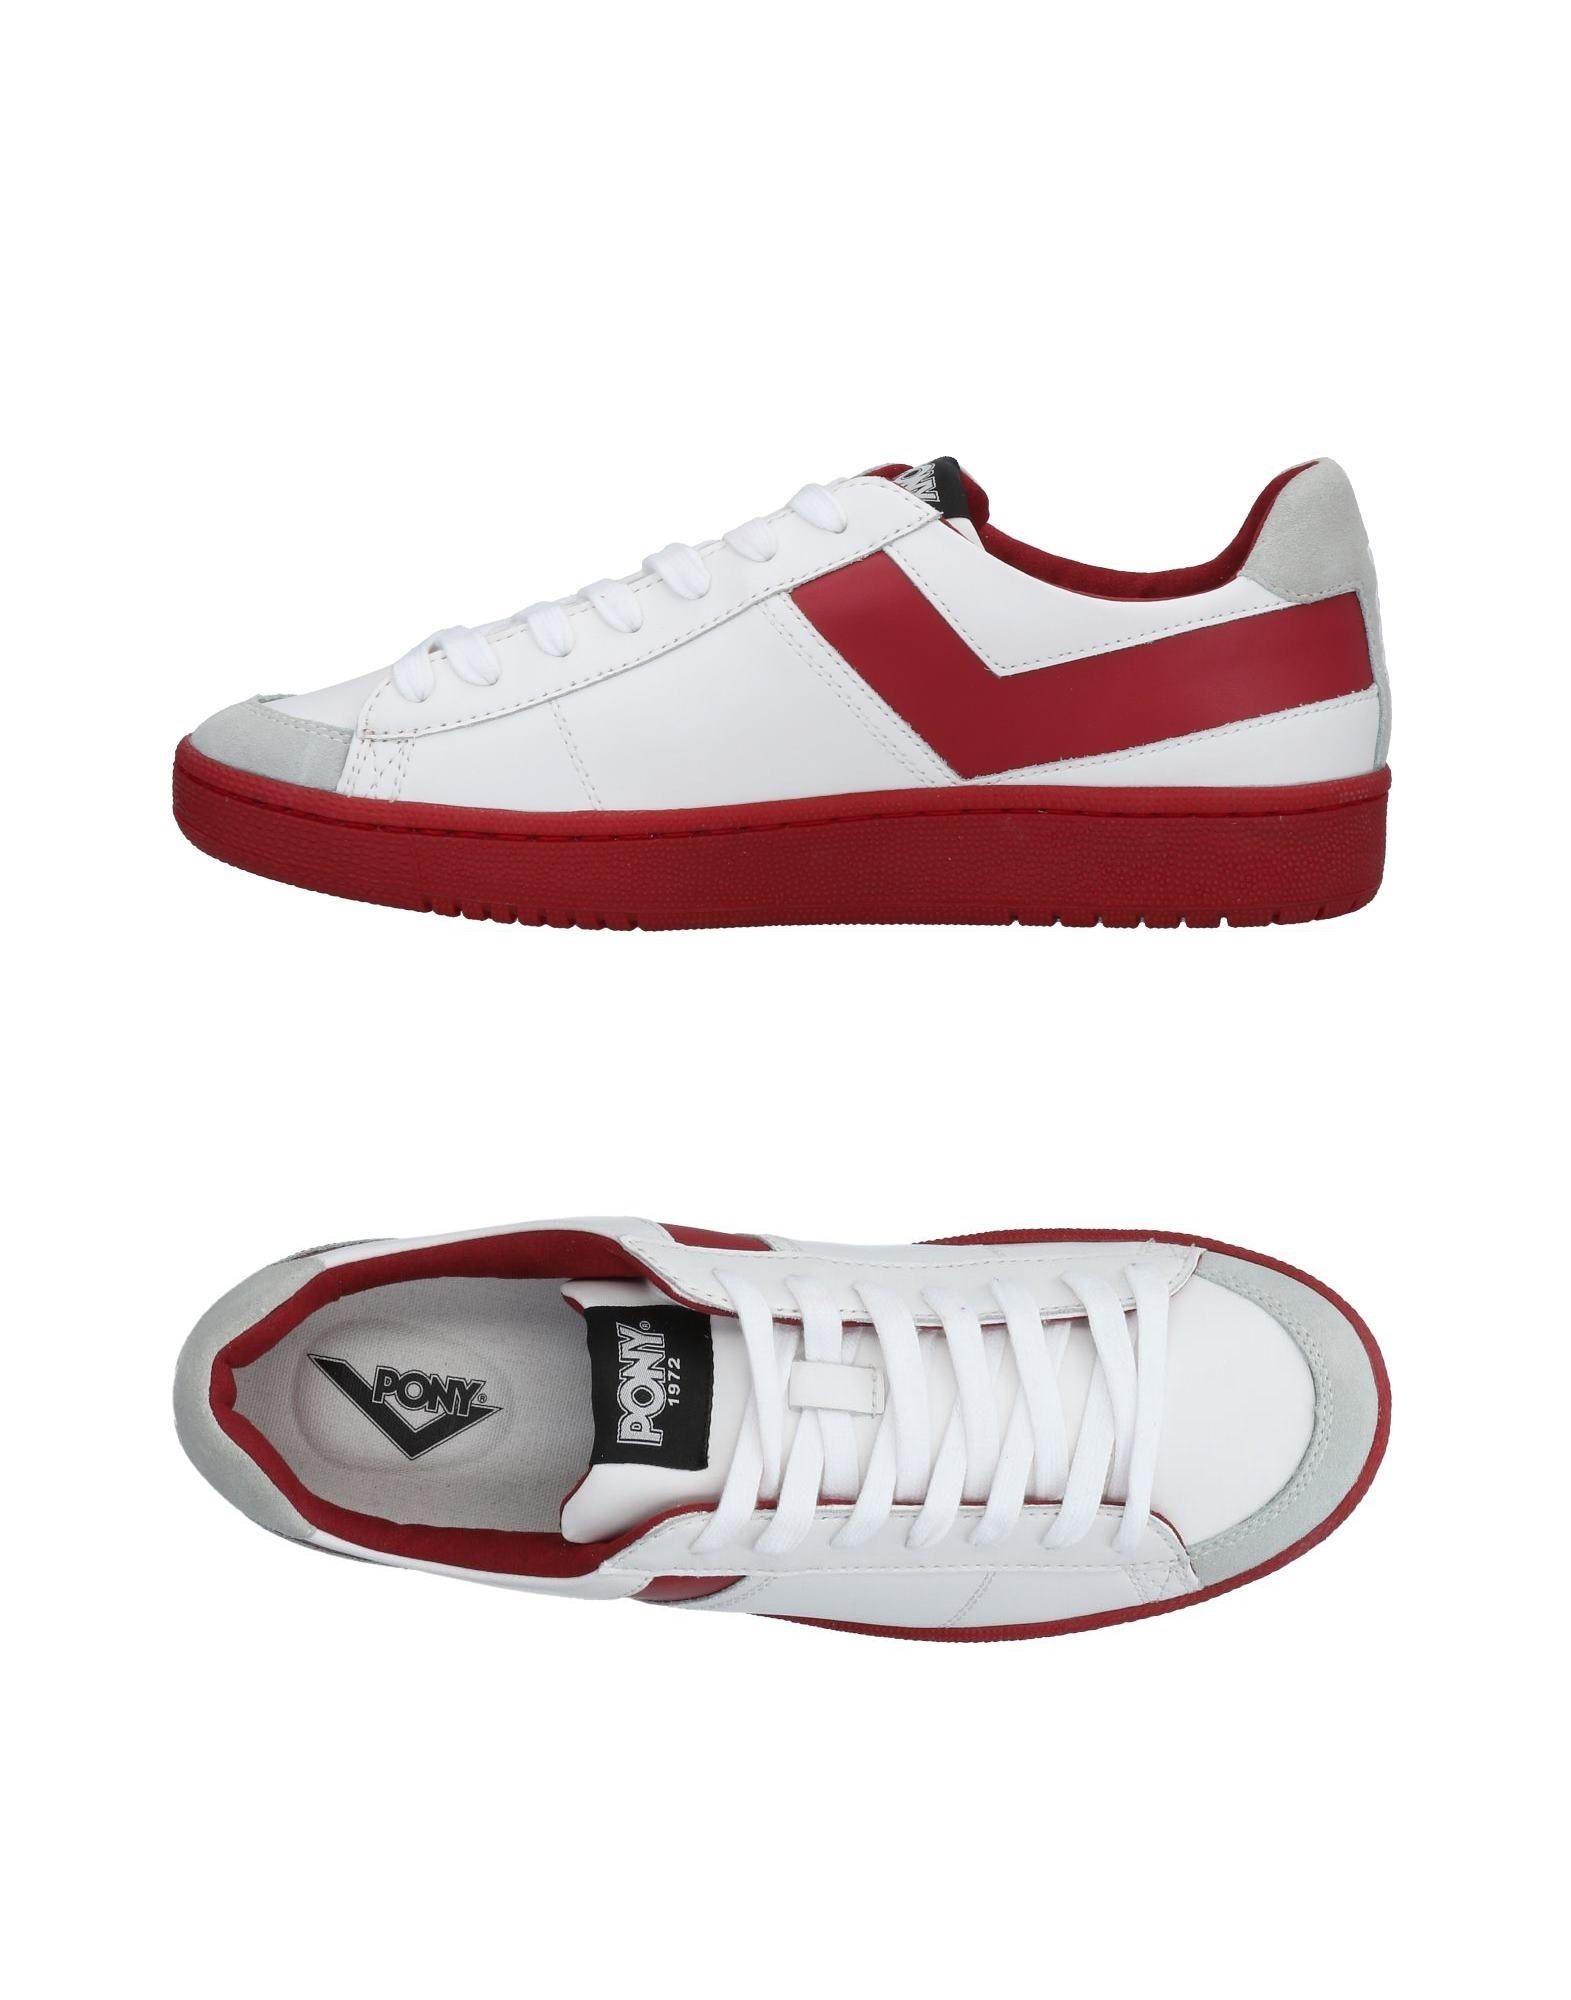 Rabatt echte Schuhe 11485422JJ Pony Sneakers Herren  11485422JJ Schuhe 5ccb37